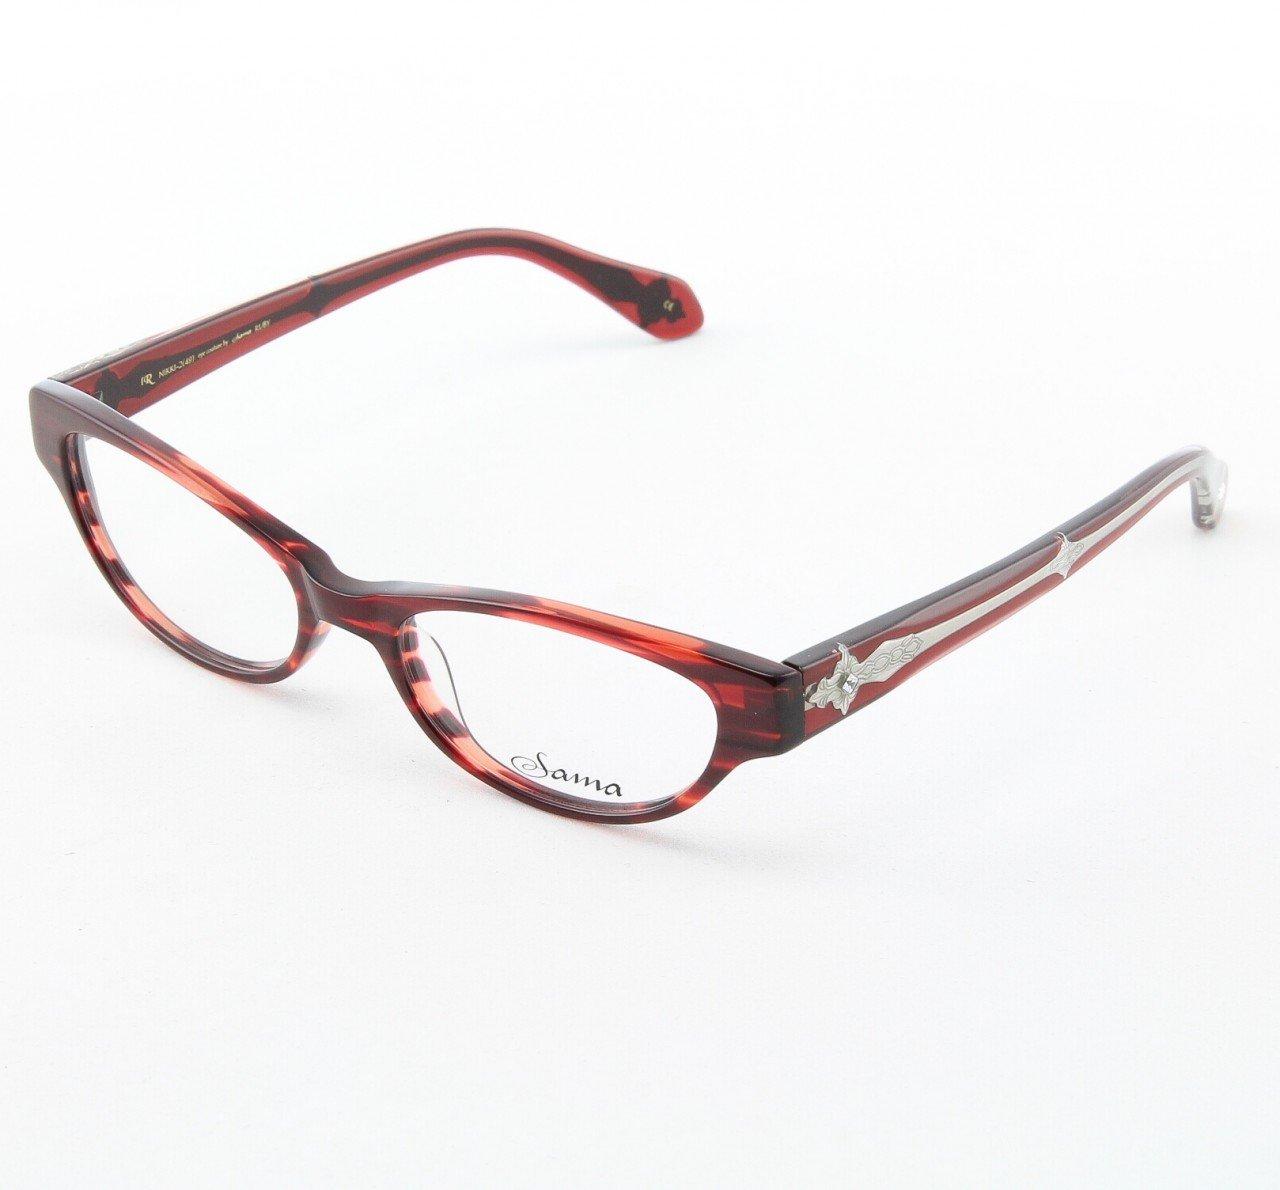 Loree Rodkin Nikki Eyeglasses Ruby w/ Clear Lenses, Swarovski Crystals & Decorative Temple Core